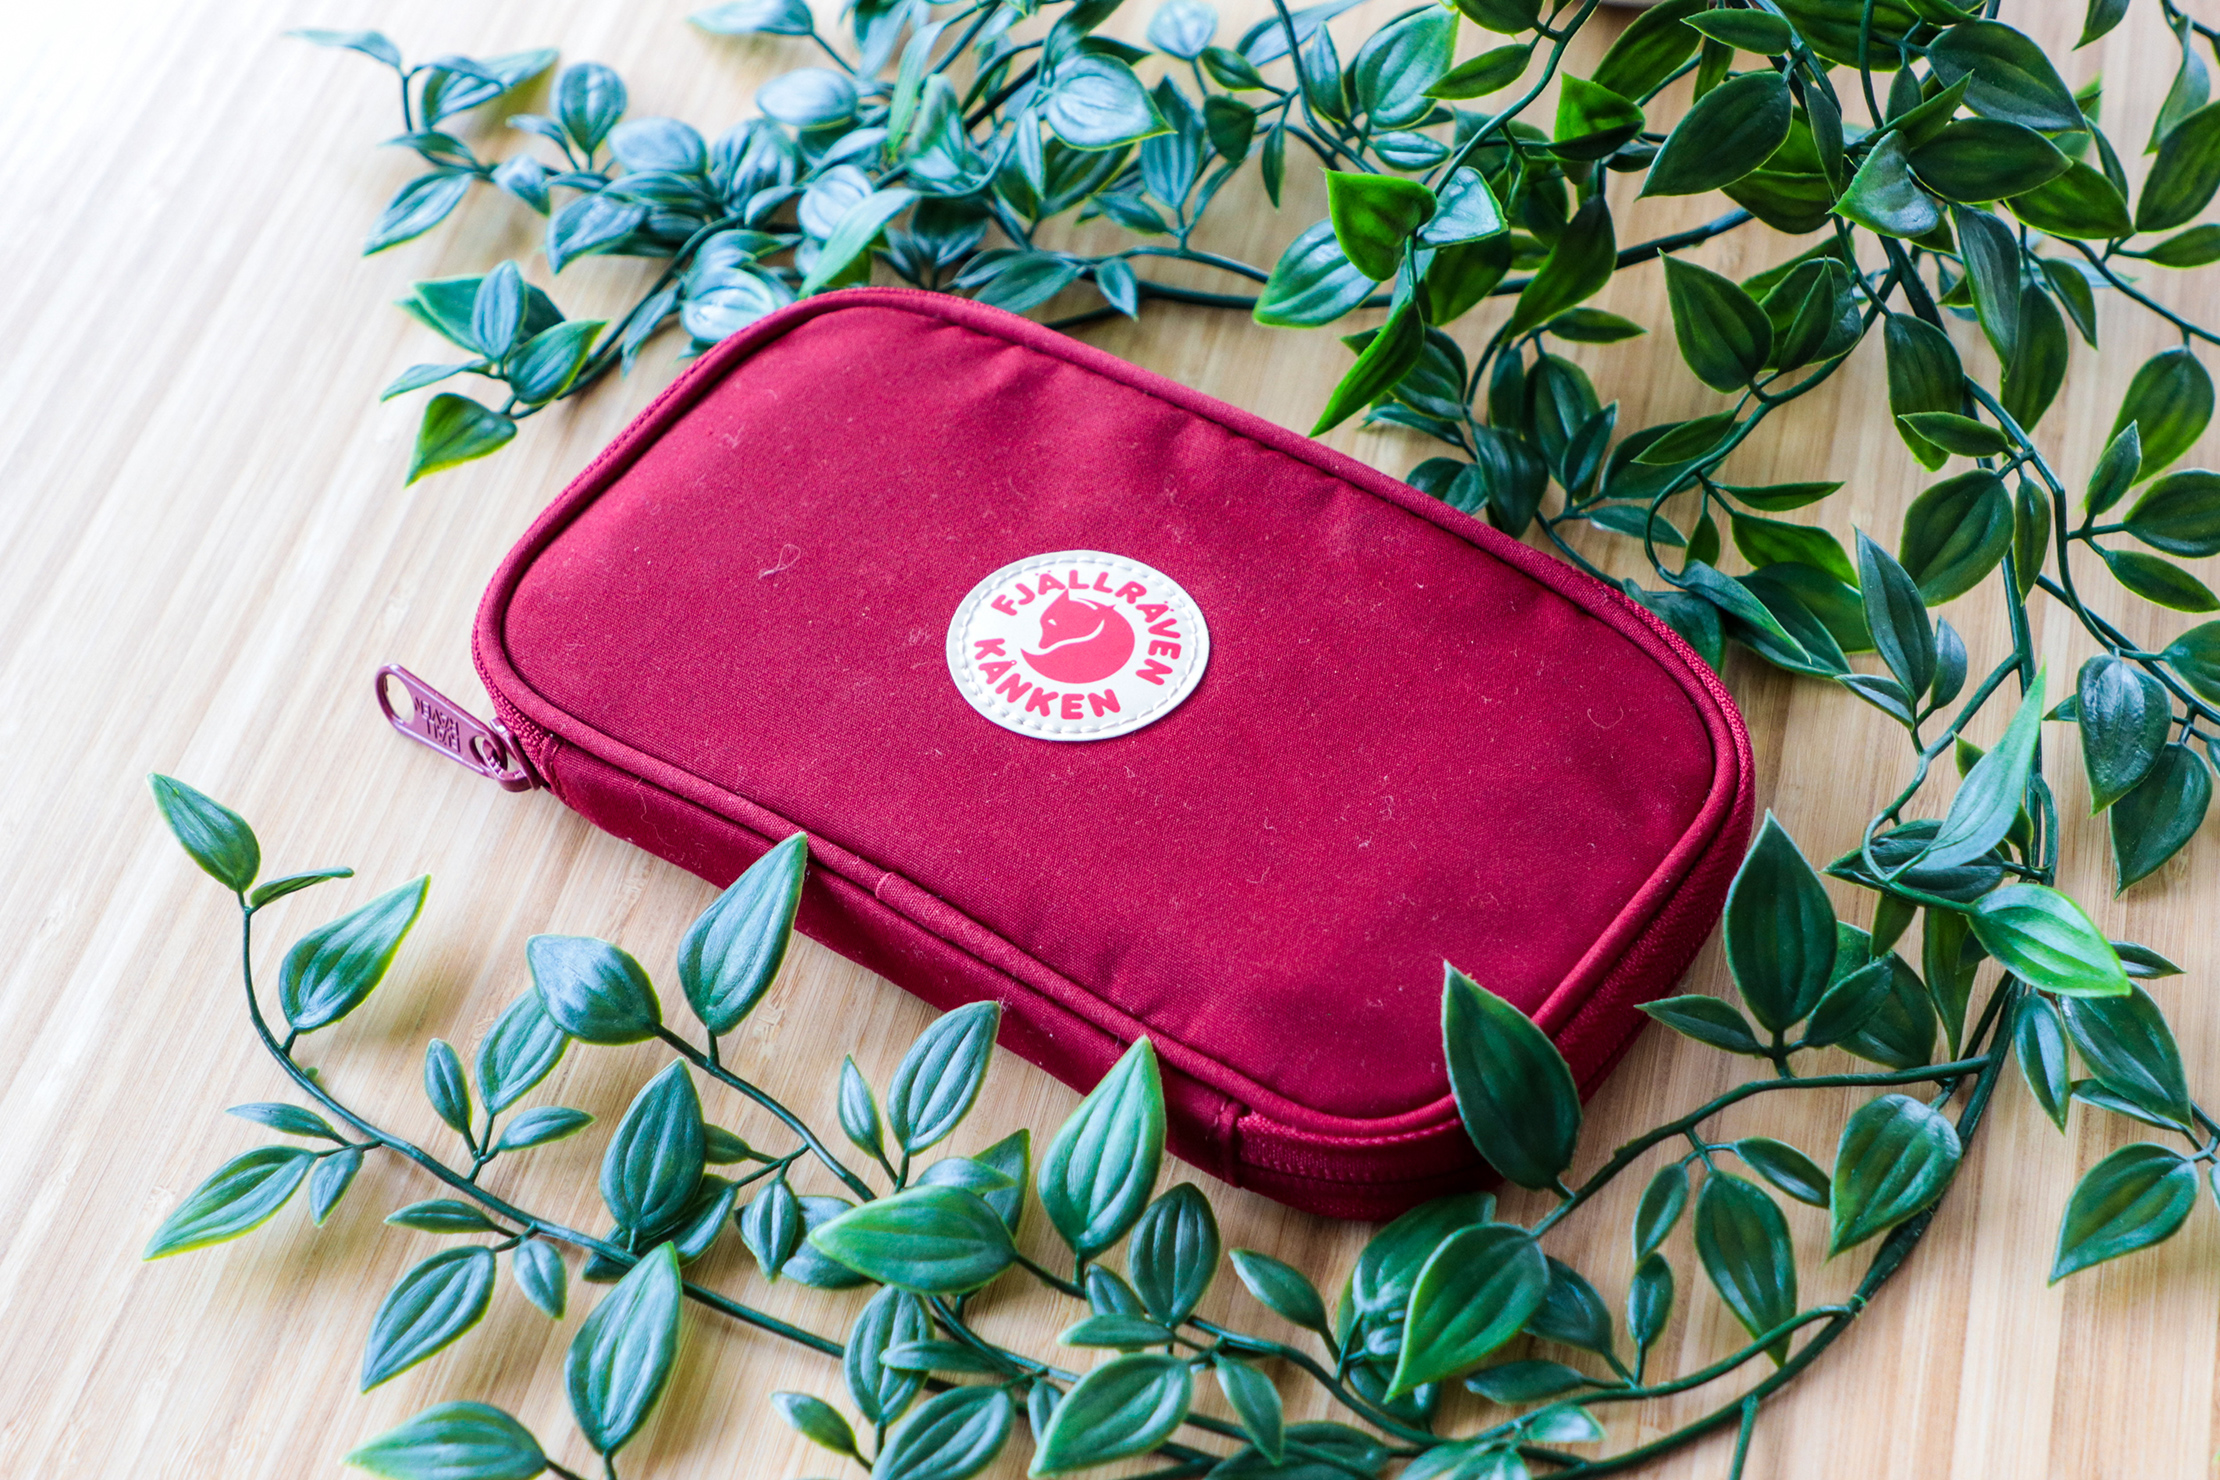 Fjallraven Kanken Travel Wallet With Plants